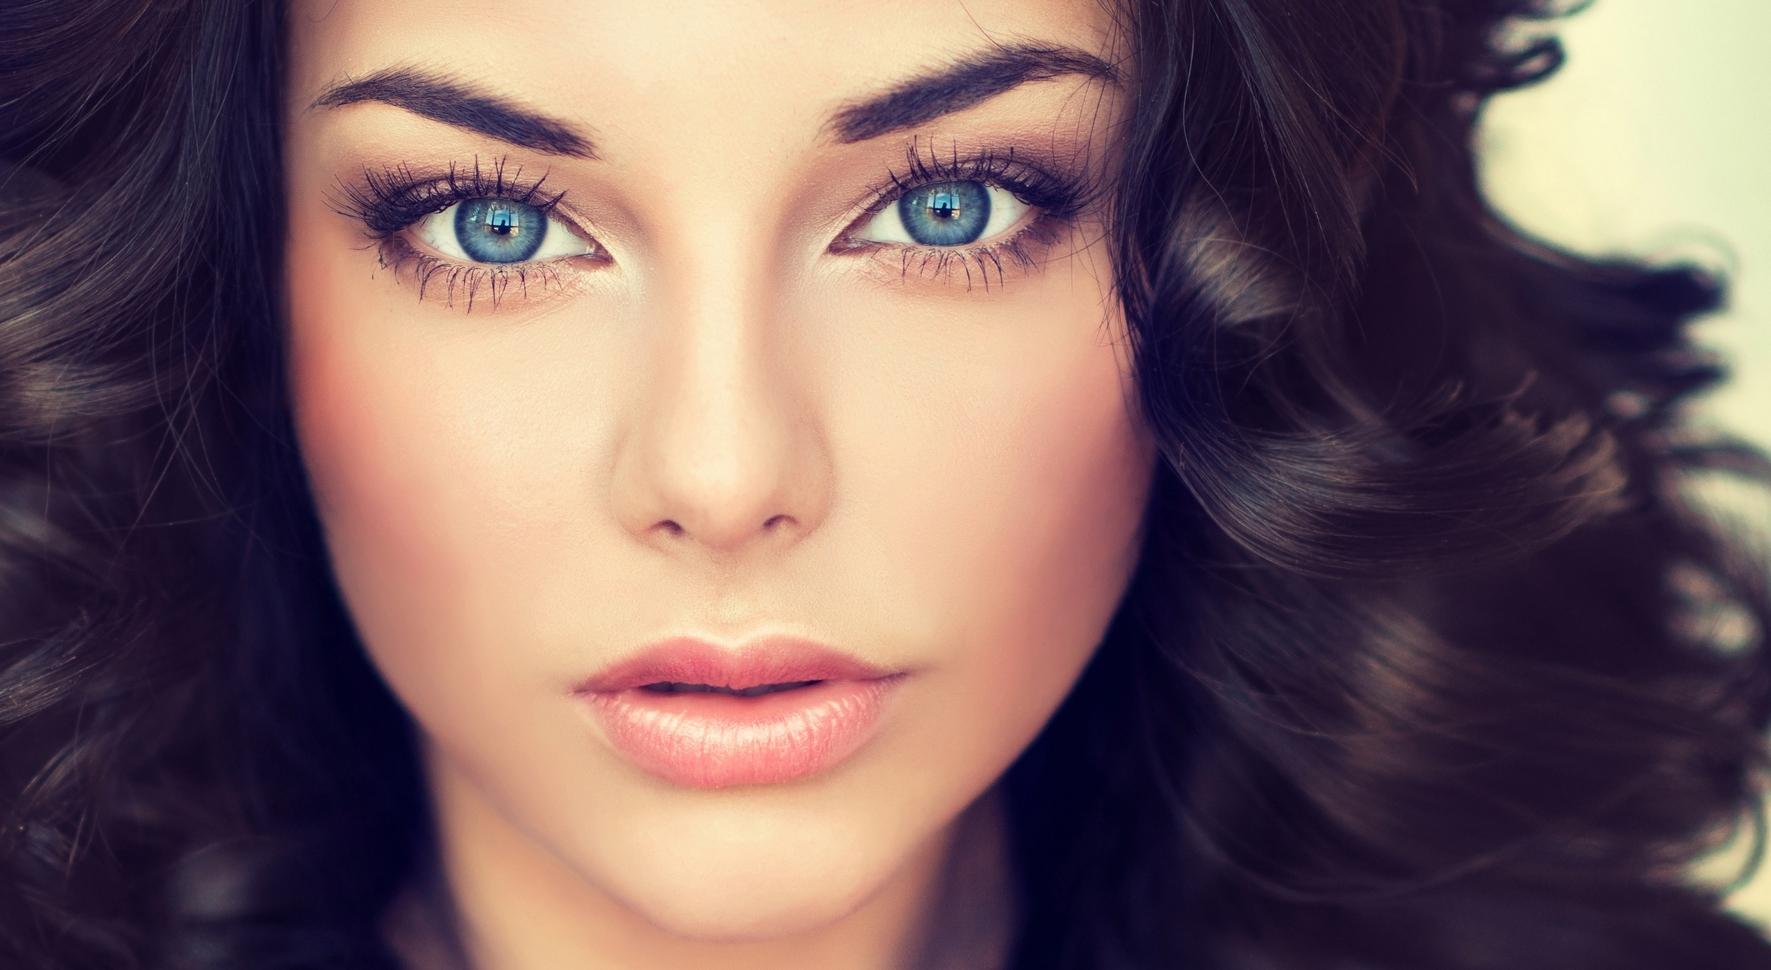 Best Eye Shadow Colors For Blue Eyes | Lovetoknow with regard to Best Eyeshadow Color For Blue Eyes And Dark Hair